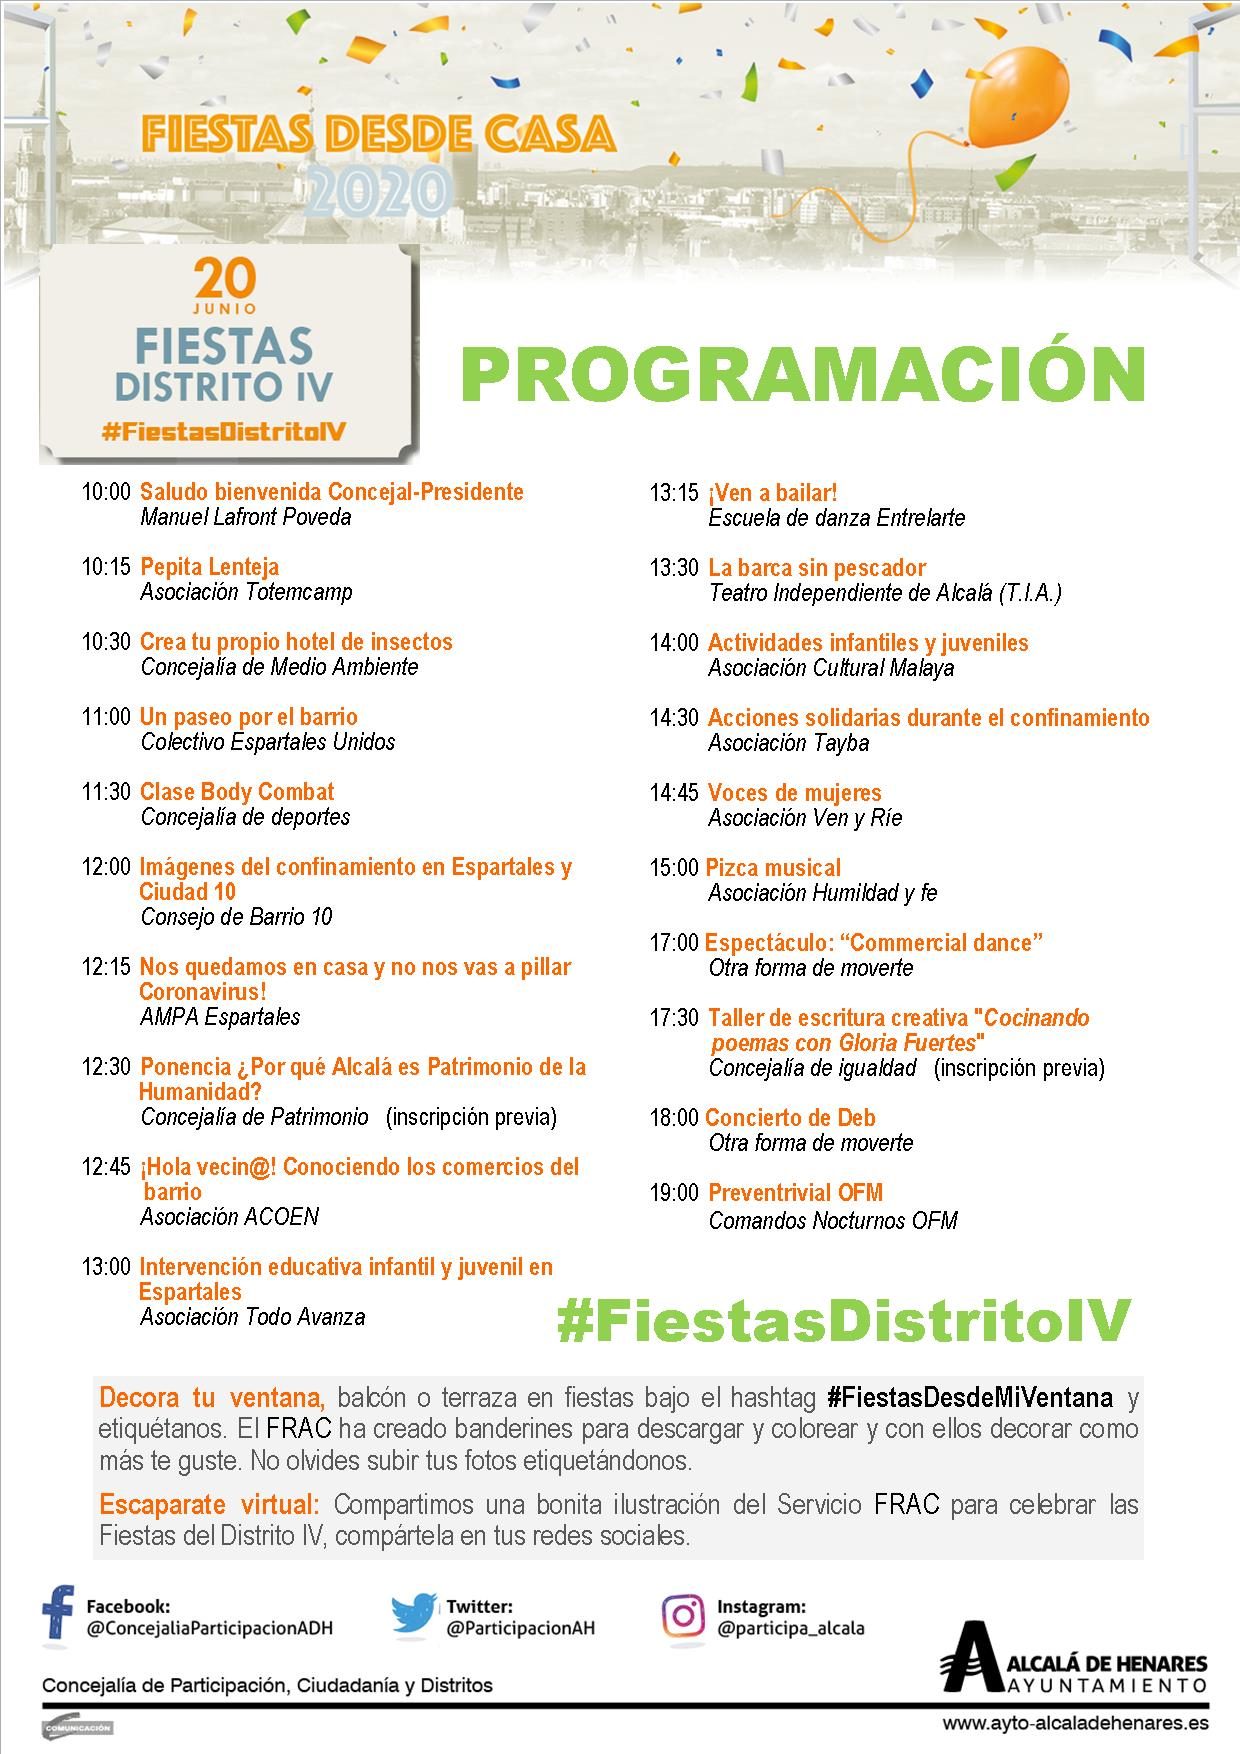 Programacion Fiesta D IV